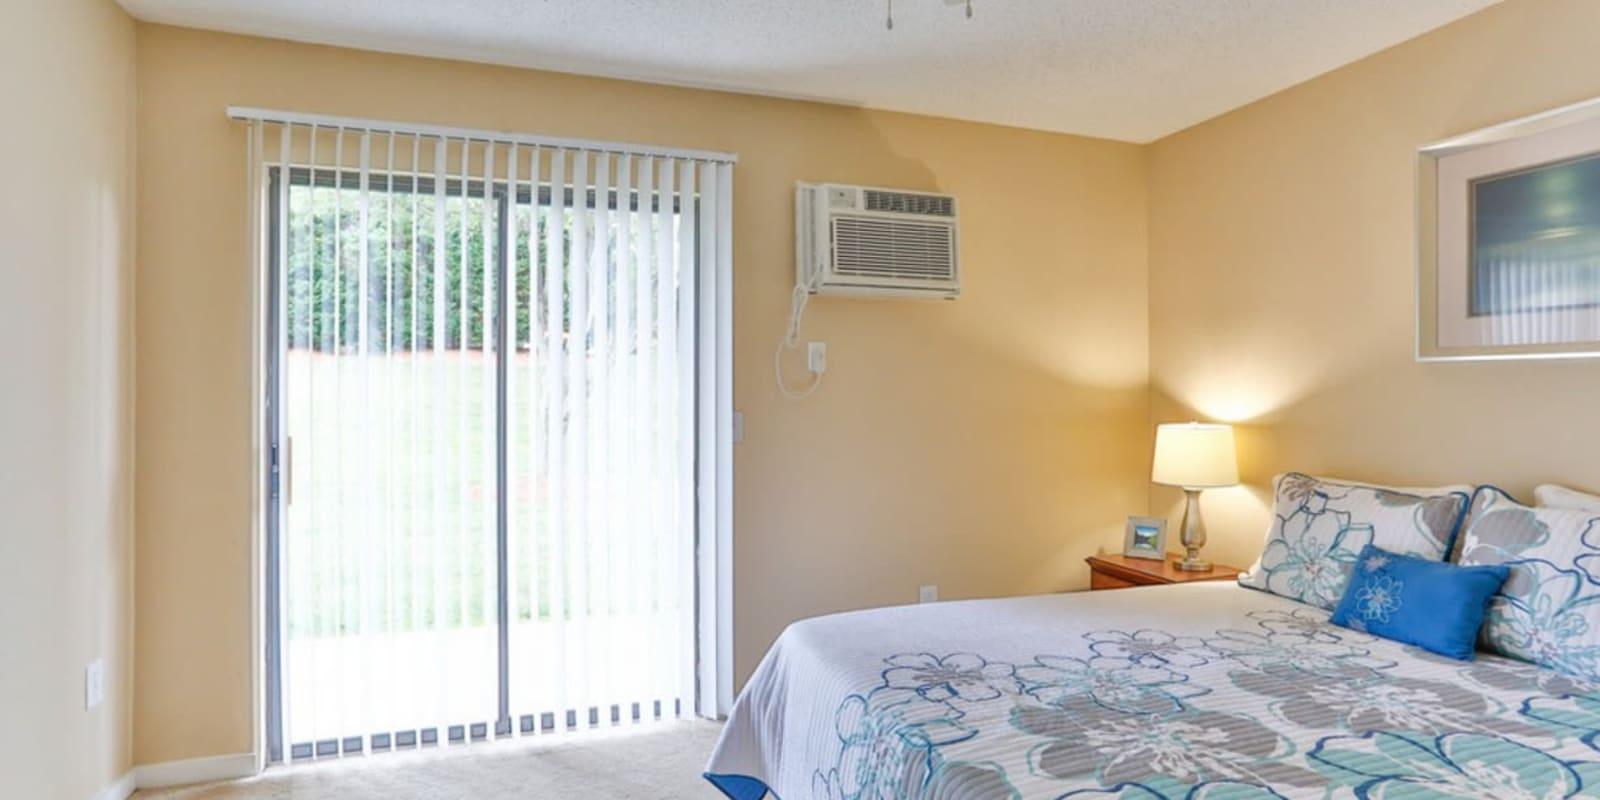 Main bedroom with balcony access at Huntersville Apartment Homes in Huntersville, North Carolina